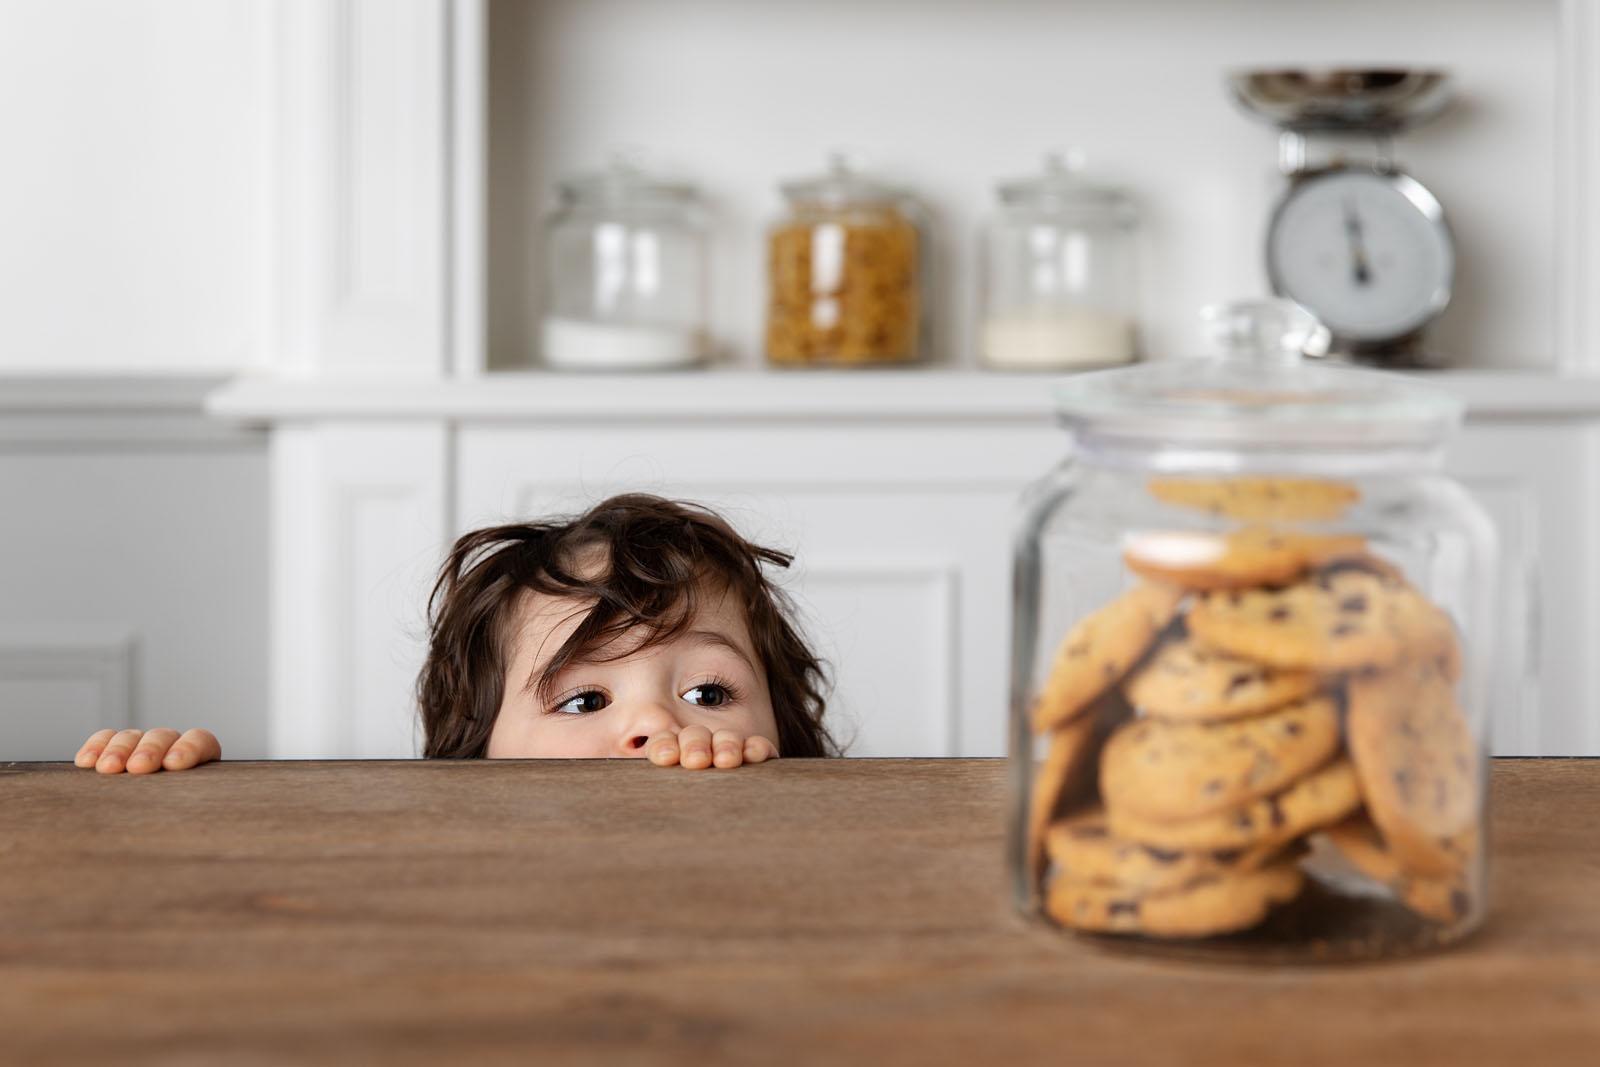 child-peeking-over-counter-at-cookie-jar-lisa-tichane